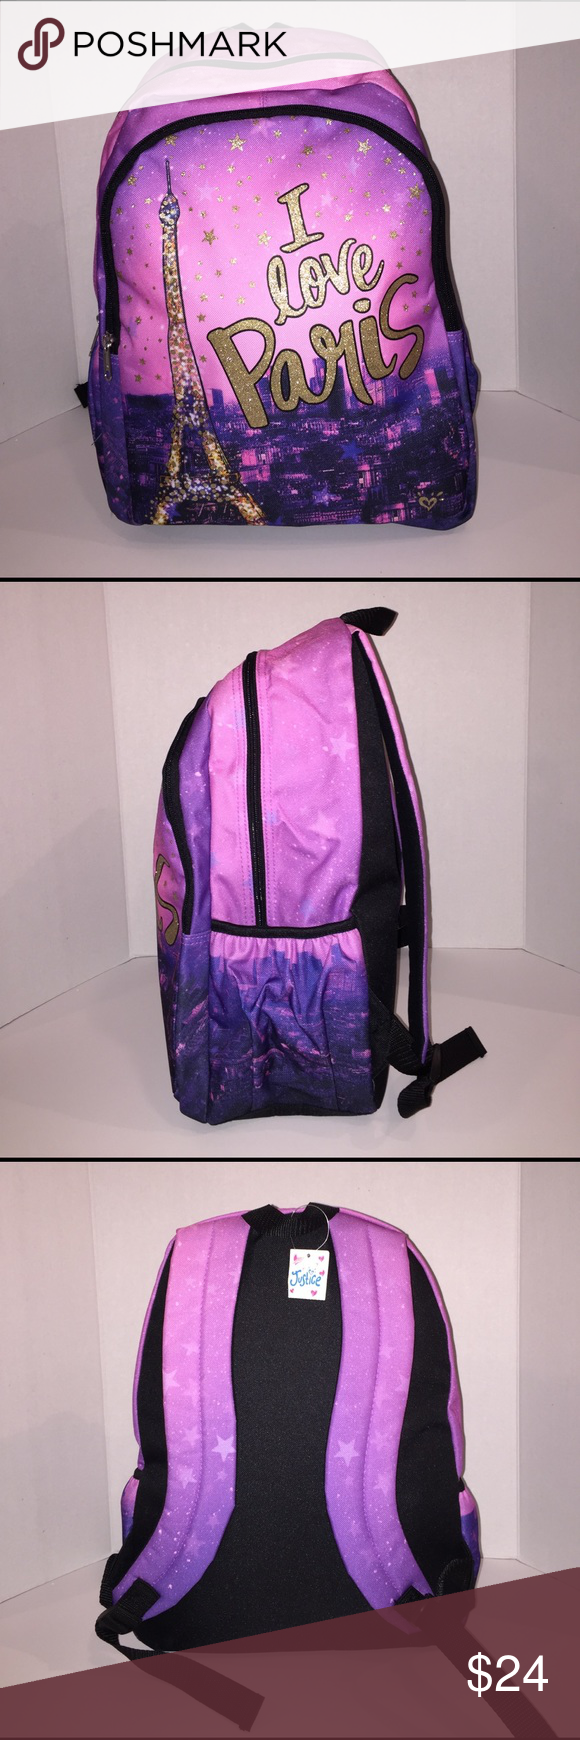 65bd801b09 Large Girly Backpacks- Fenix Toulouse Handball